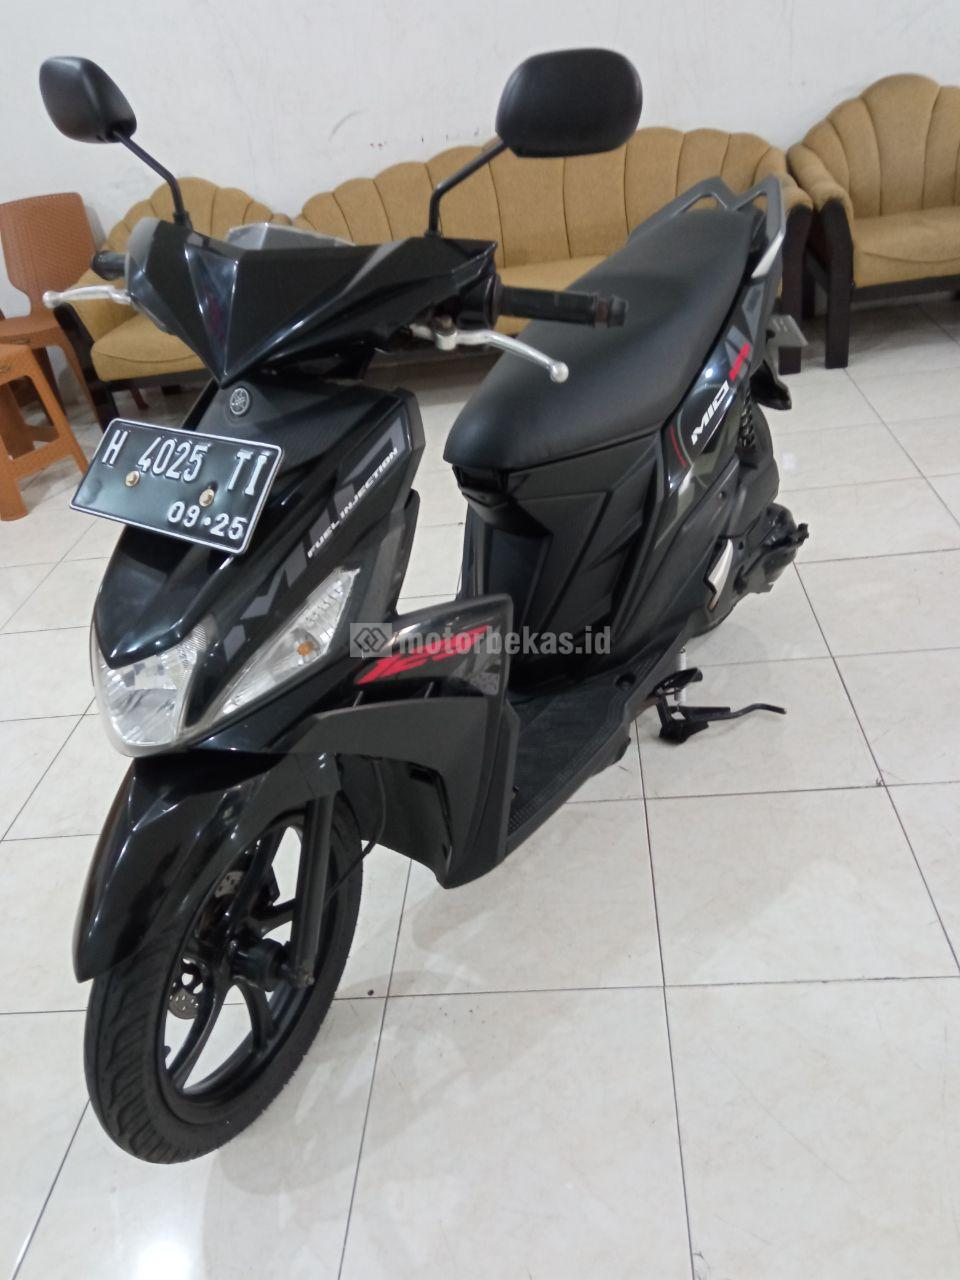 YAMAHA MIO M3  3446 motorbekas.id